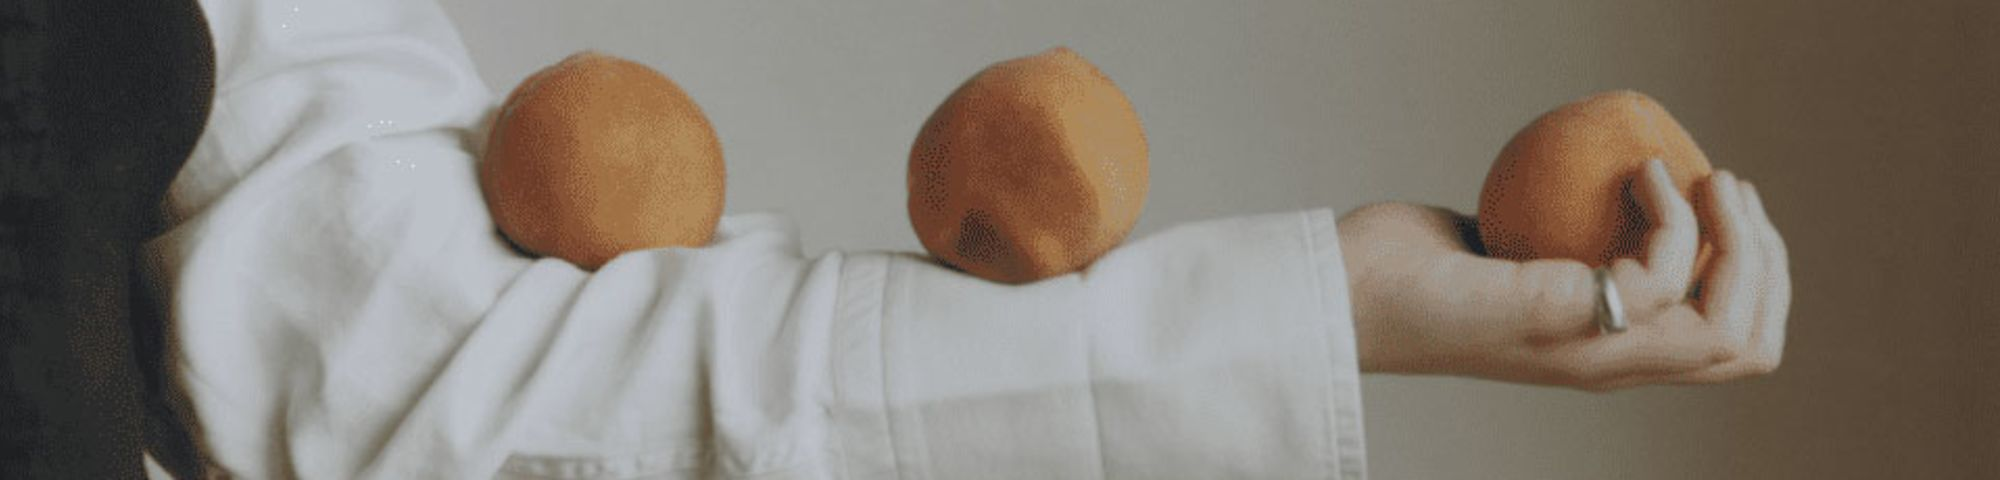 A girl balances three oranges on her arm.